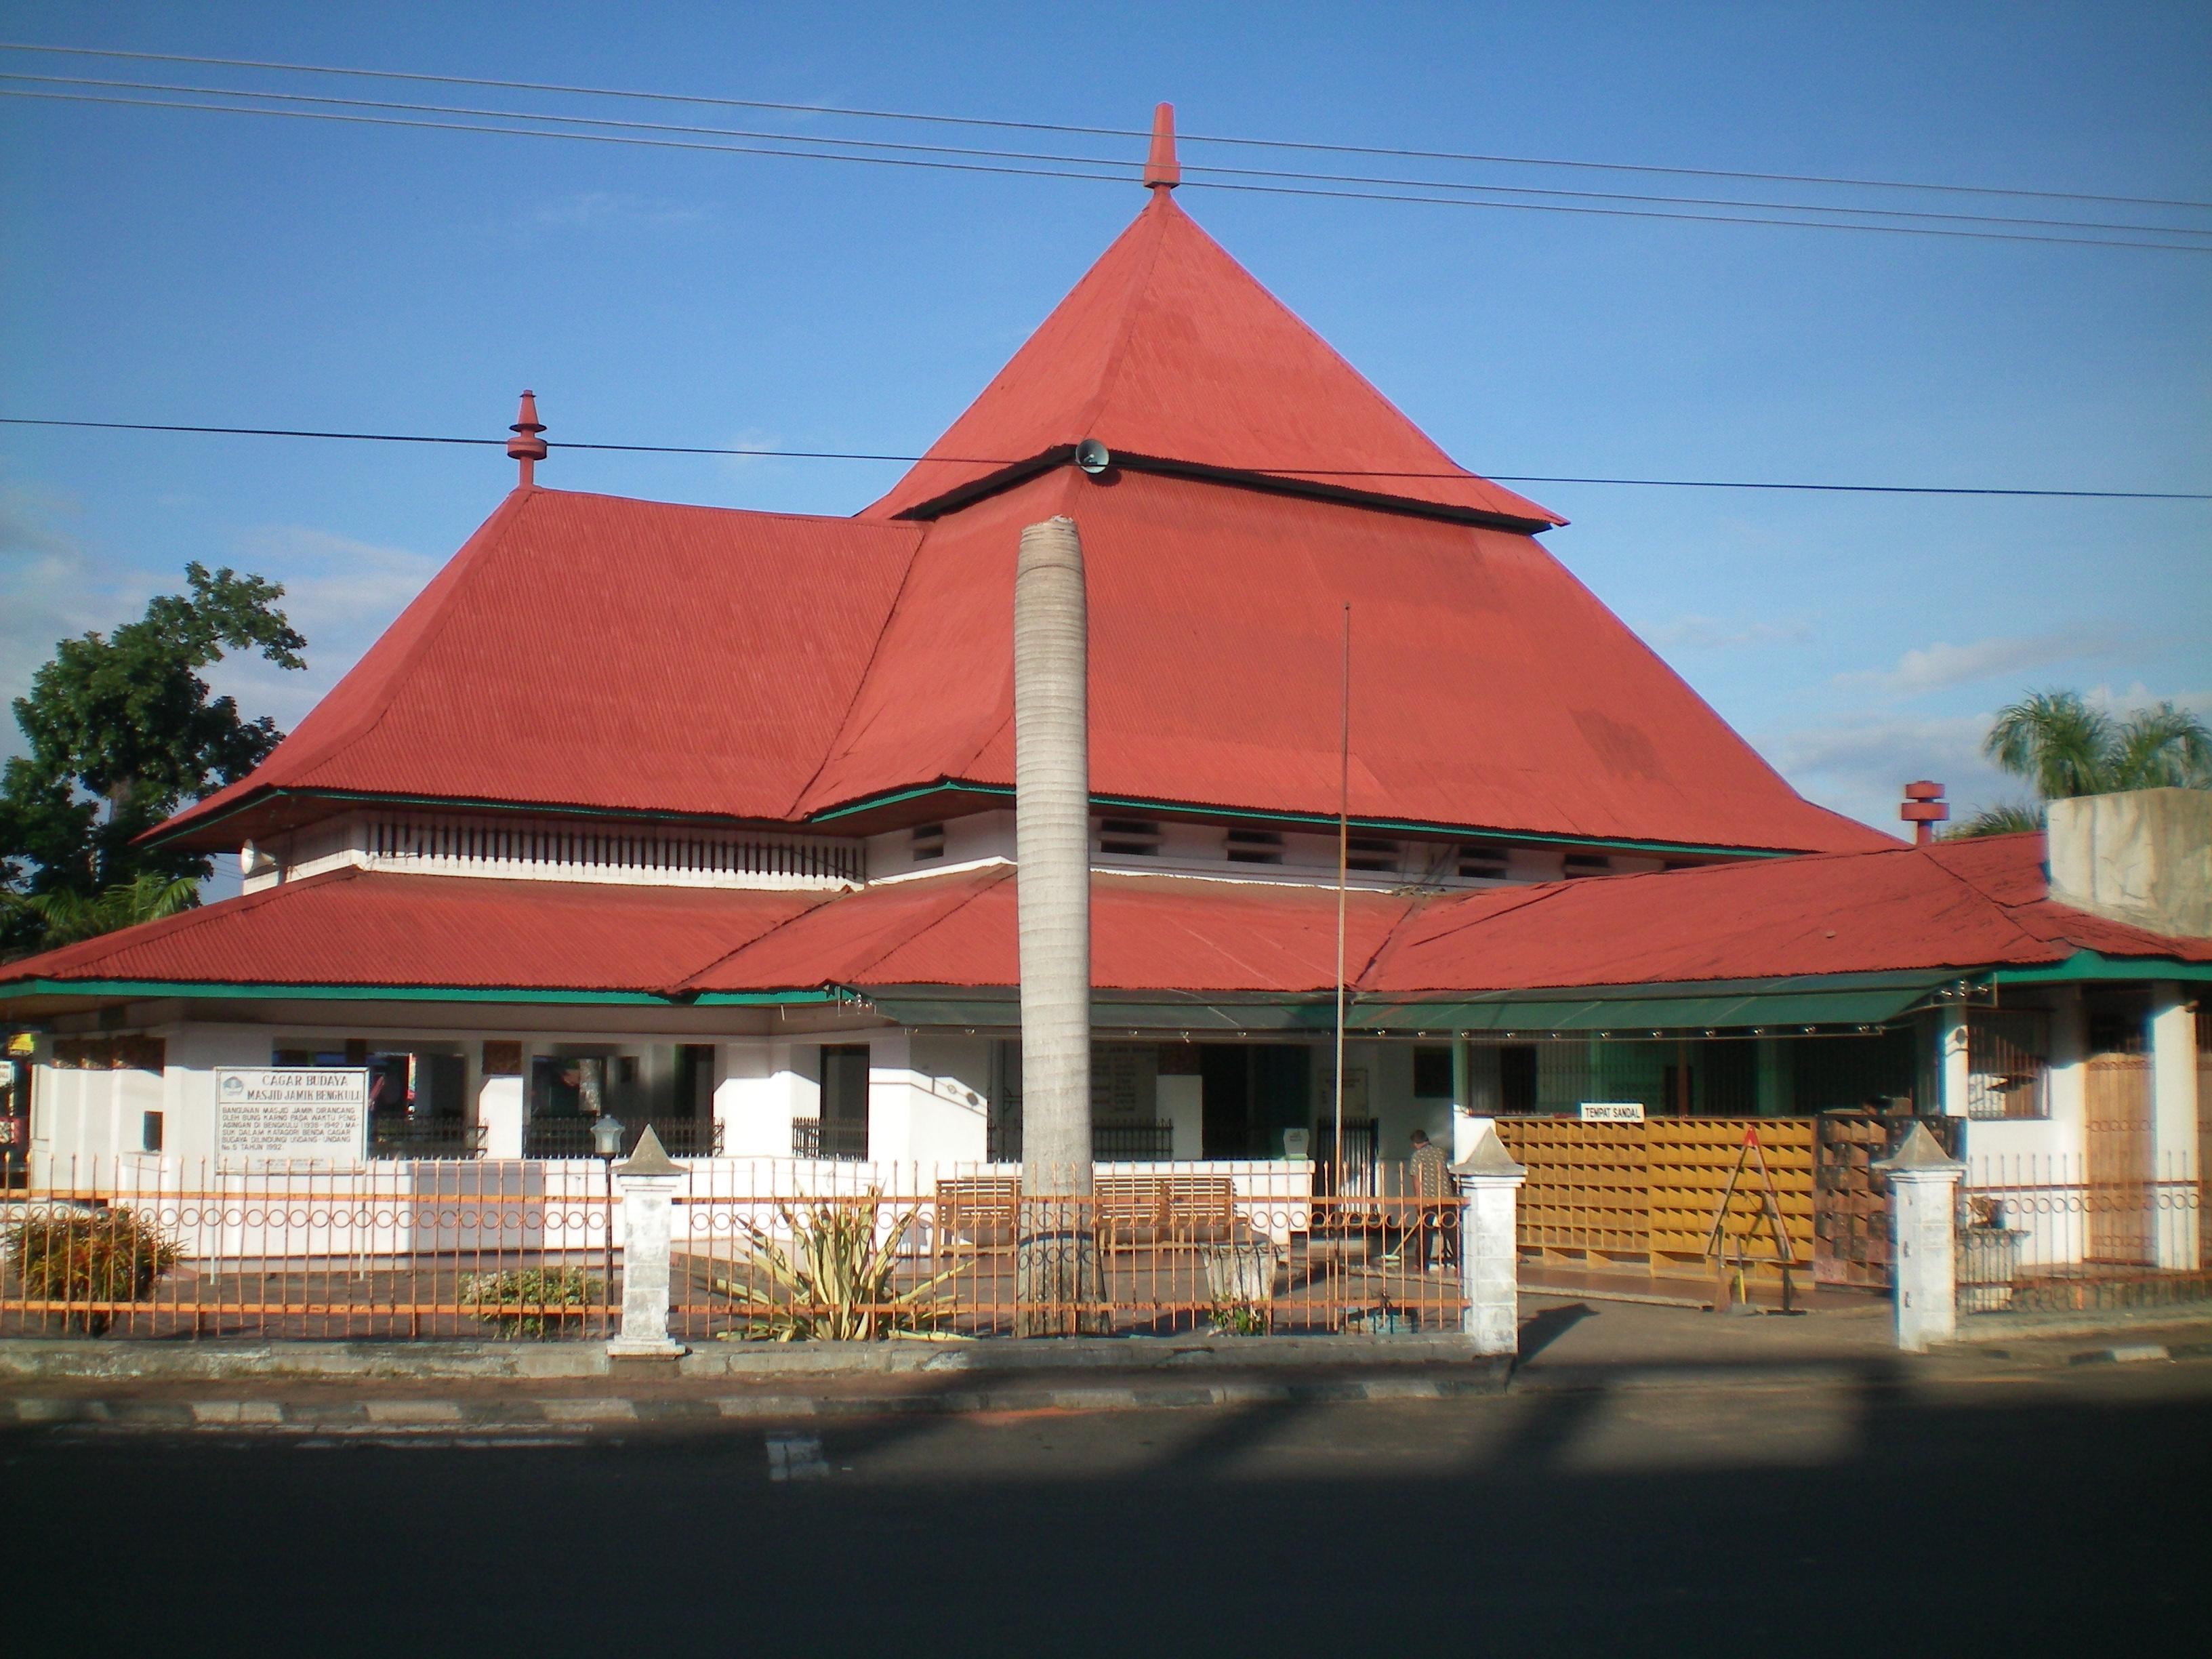 Peninggalan Bung Karno Bengkulu Kisahku Masjid Terletak Jalan Utama Kota